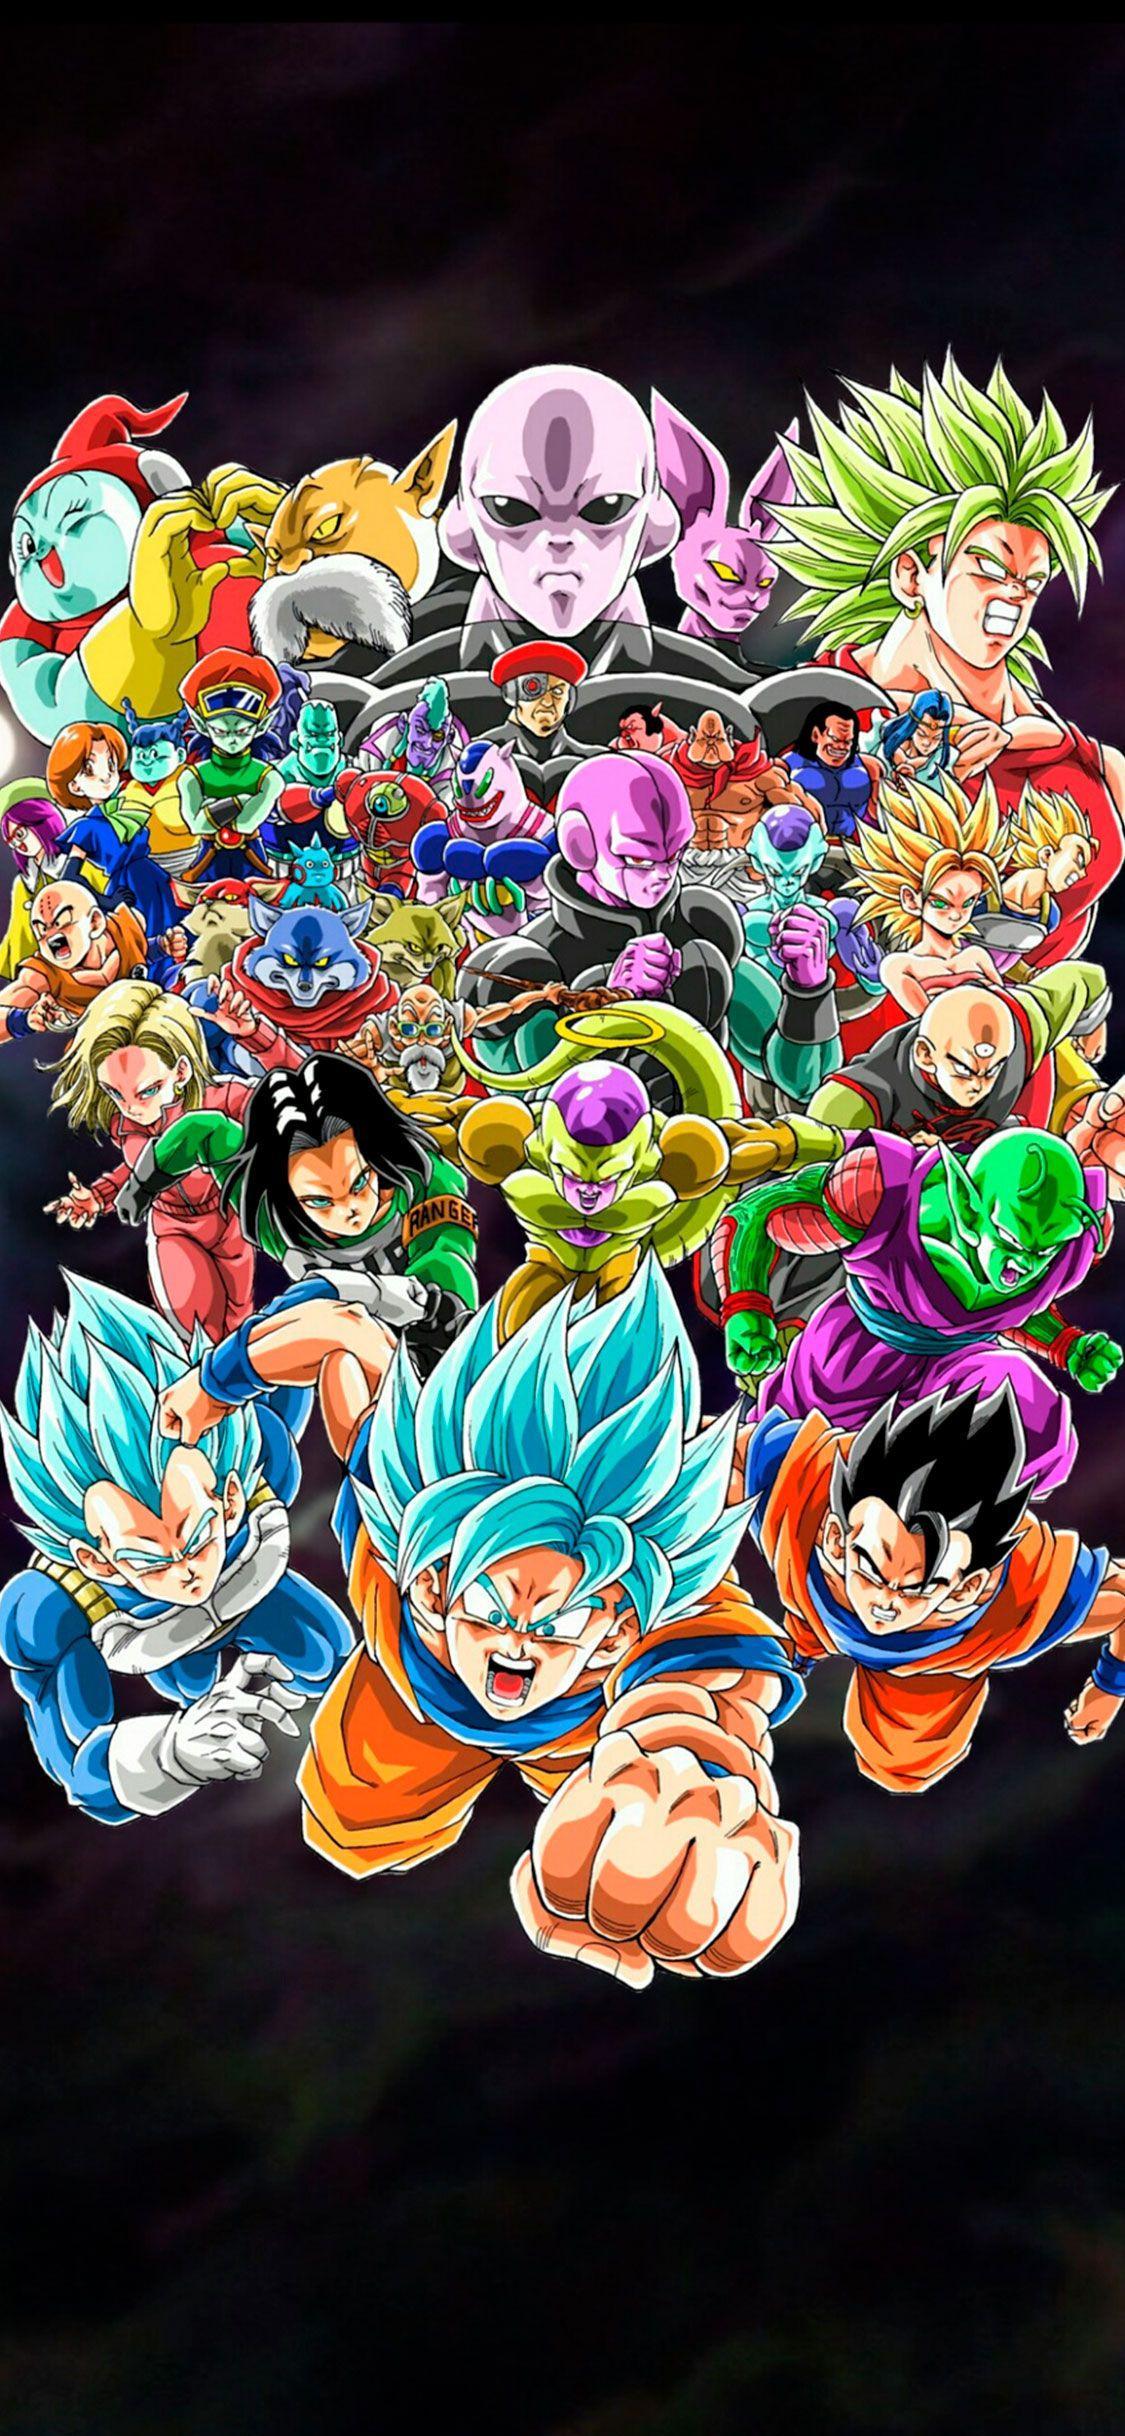 Dragon Ball Iphone Wallpapers Top Free Dragon Ball Iphone